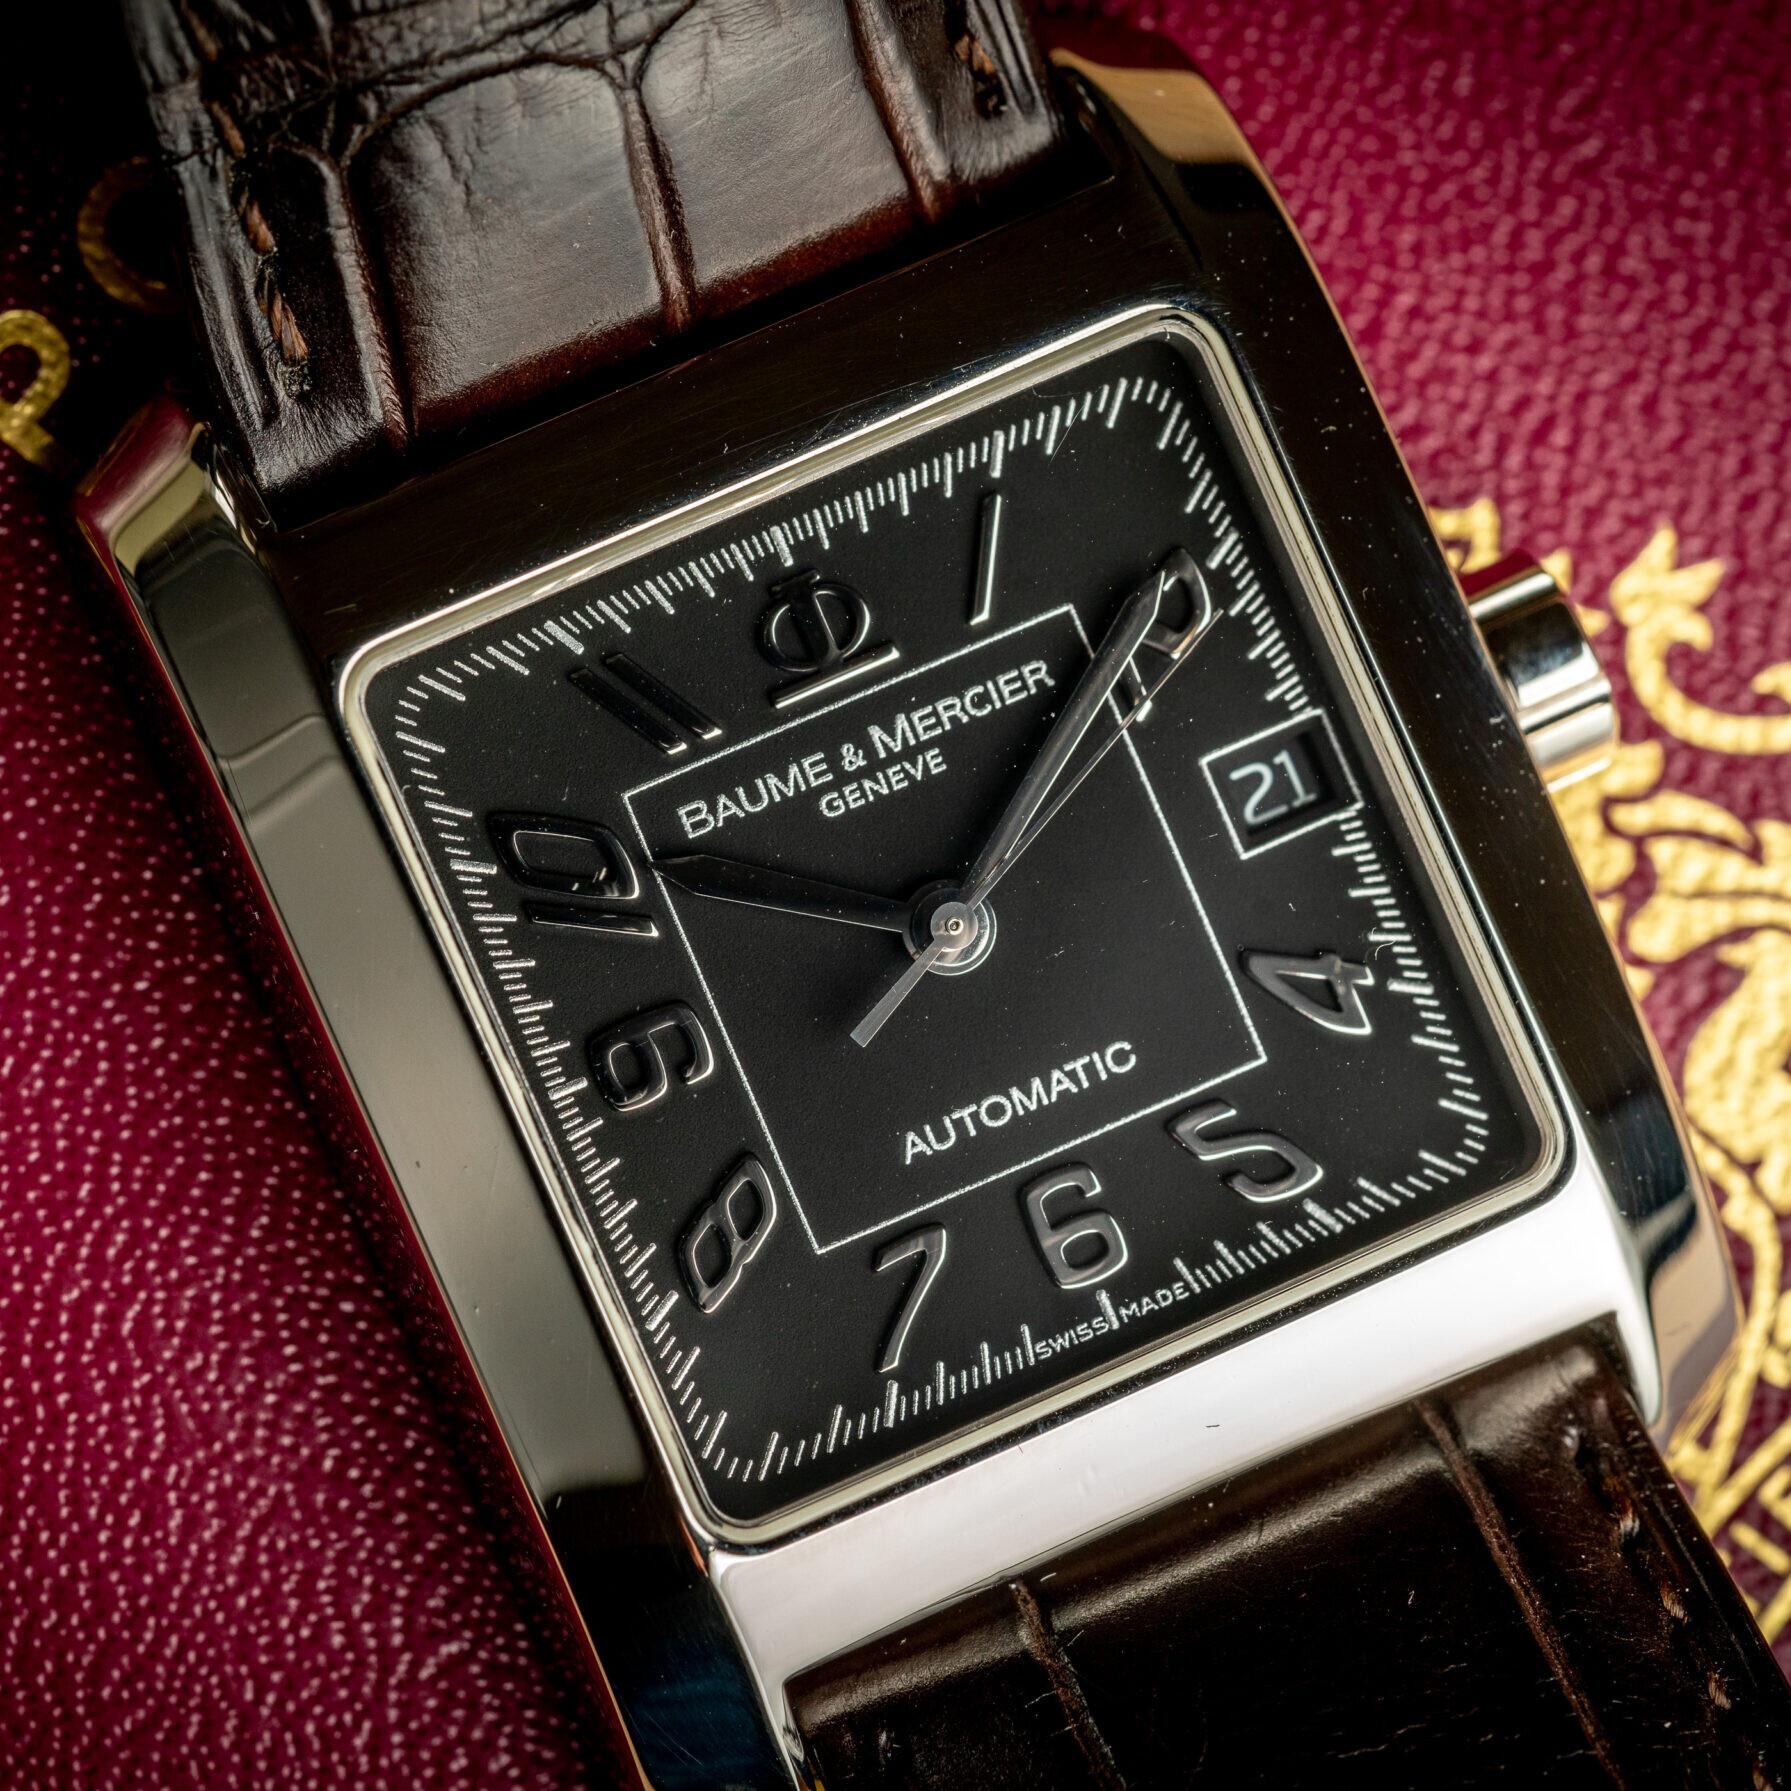 Baume et mercier hampton xl 65532 watch